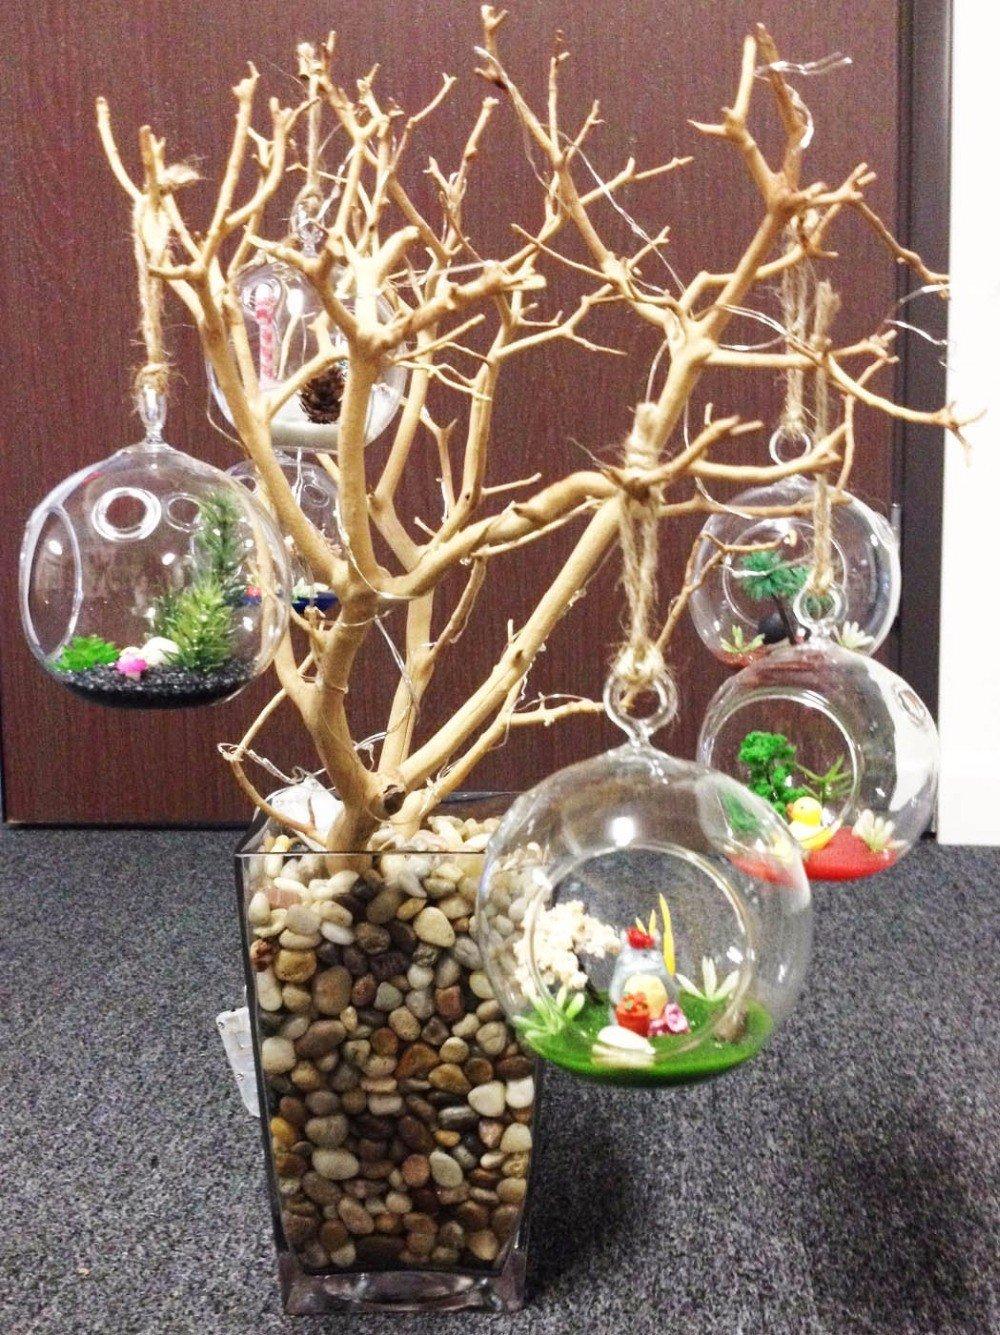 80MM Hanging Tealight Holder Glass Globes Terrarium Wedding Candle Holder Candlestick (90 Pcs/set)